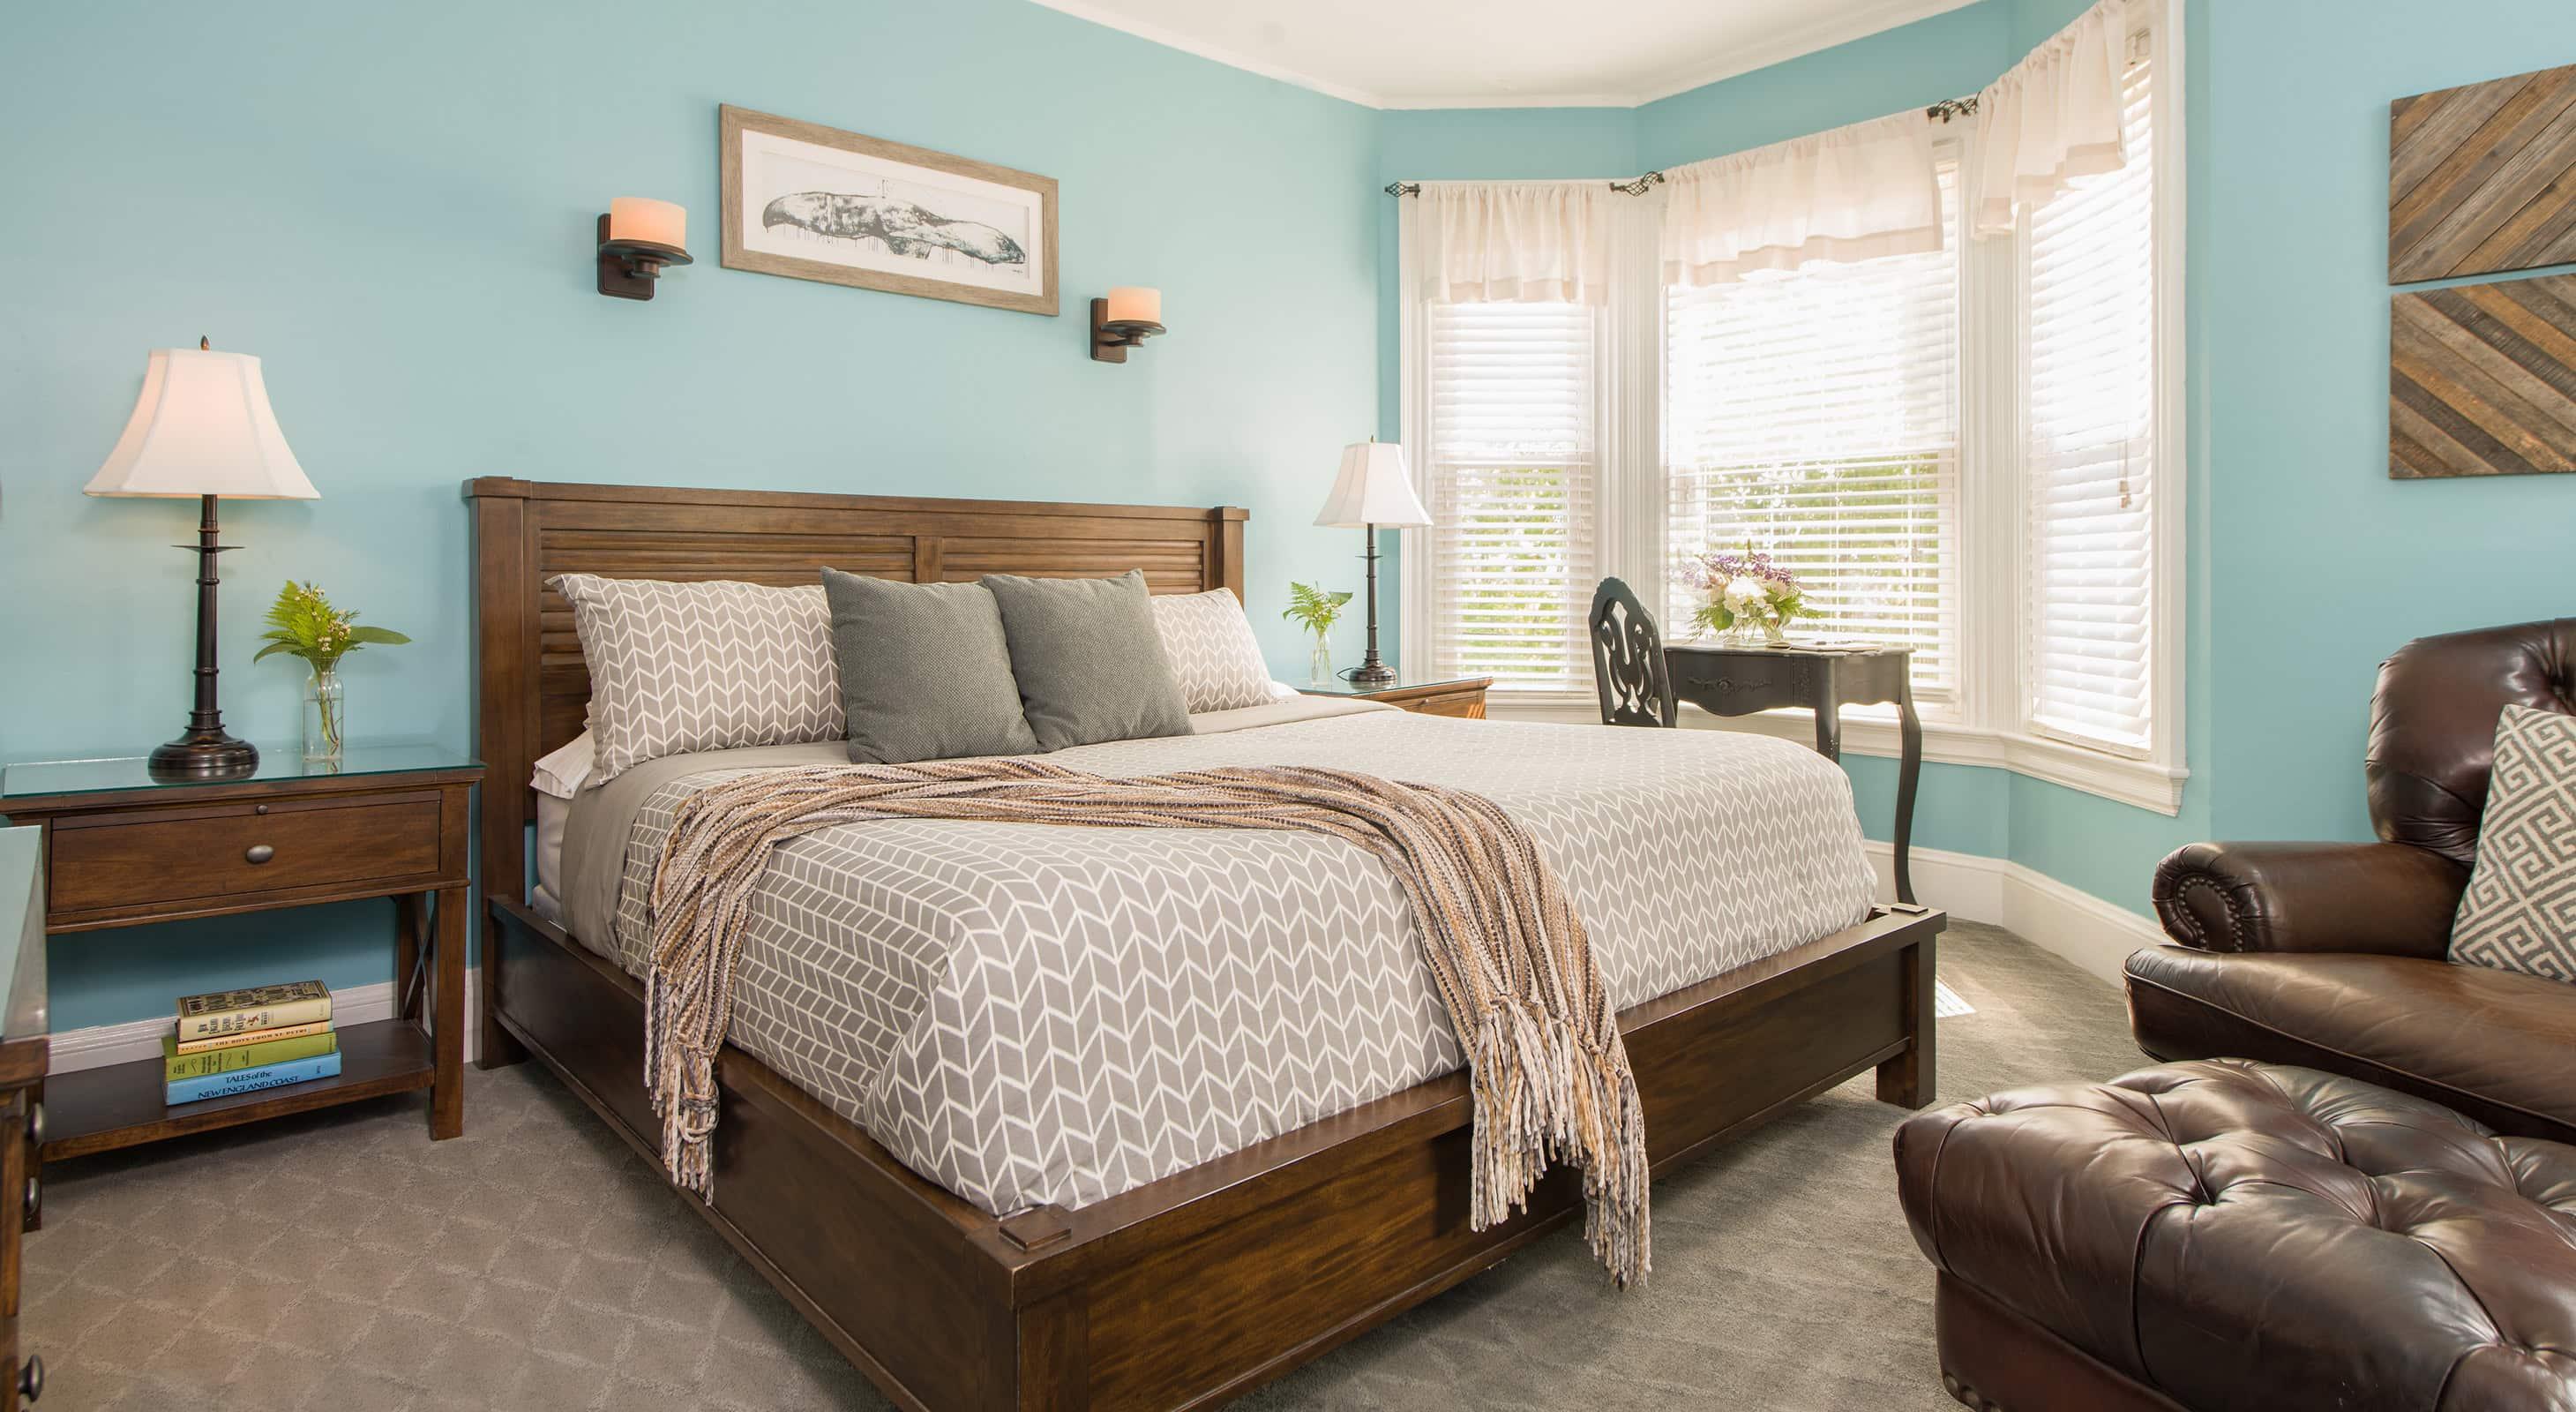 Chamberlain Room bed